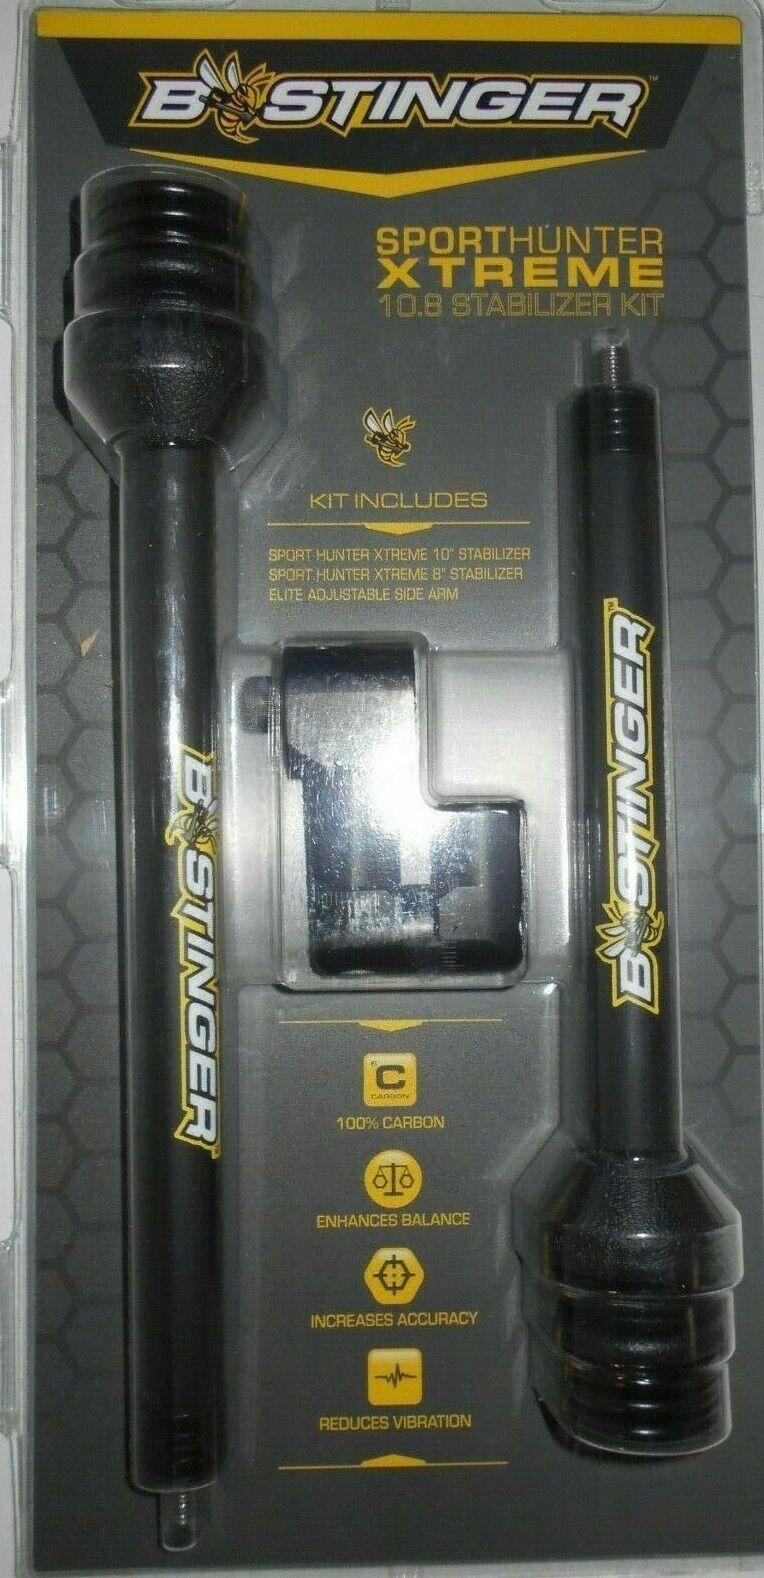 environ 20.32 cm Bee Stinger Sporthunter Xtreme Stabilisateur perdu XD 8 in SPHXN08XD Modèle